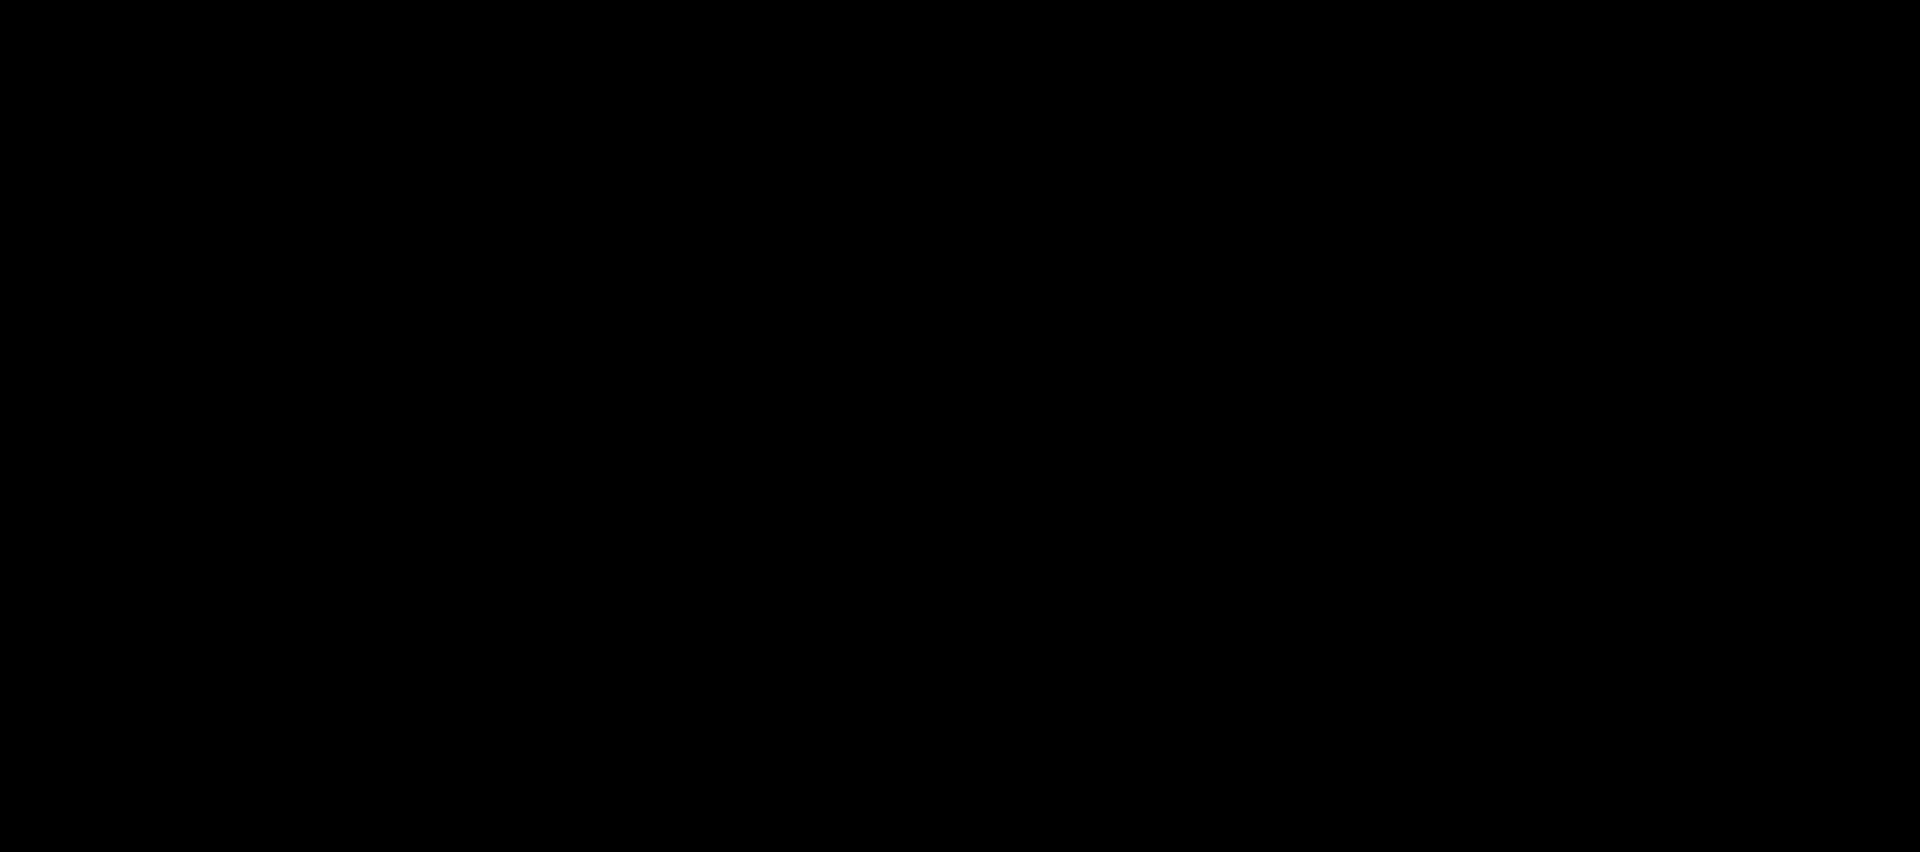 silhouette-3244888_1920